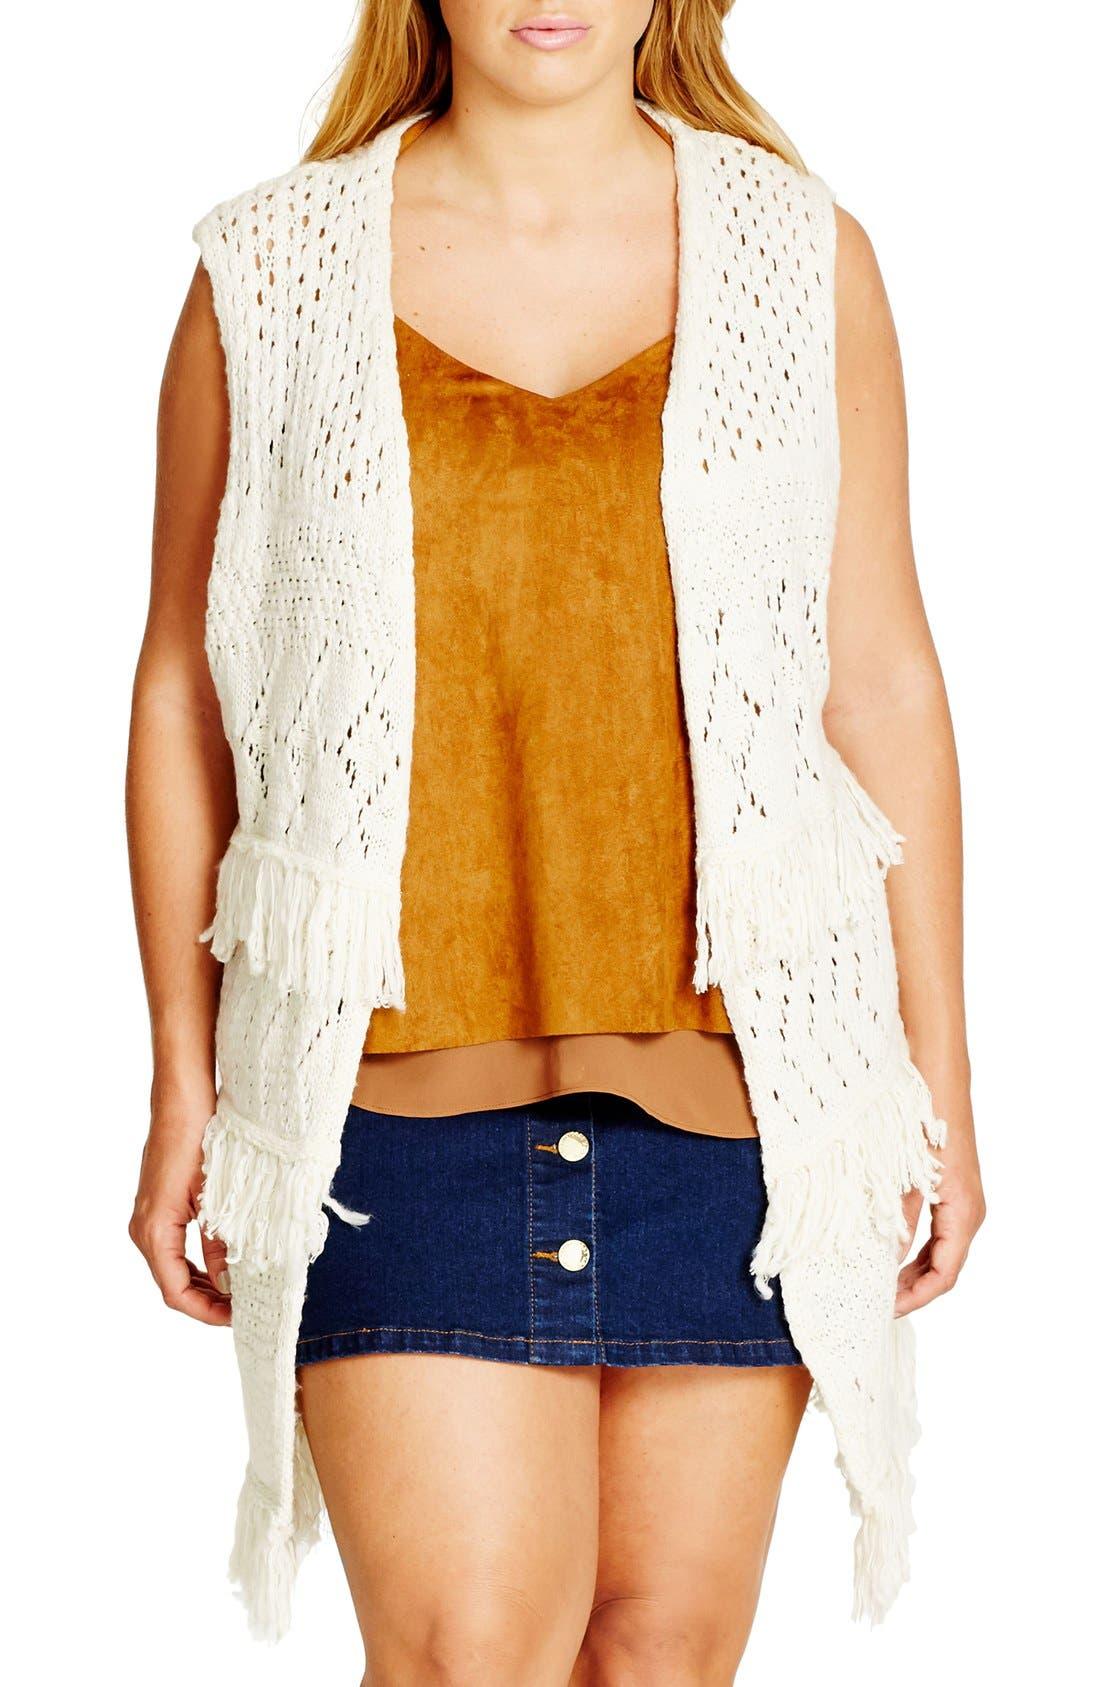 CITY CHIC Cocoon Vest